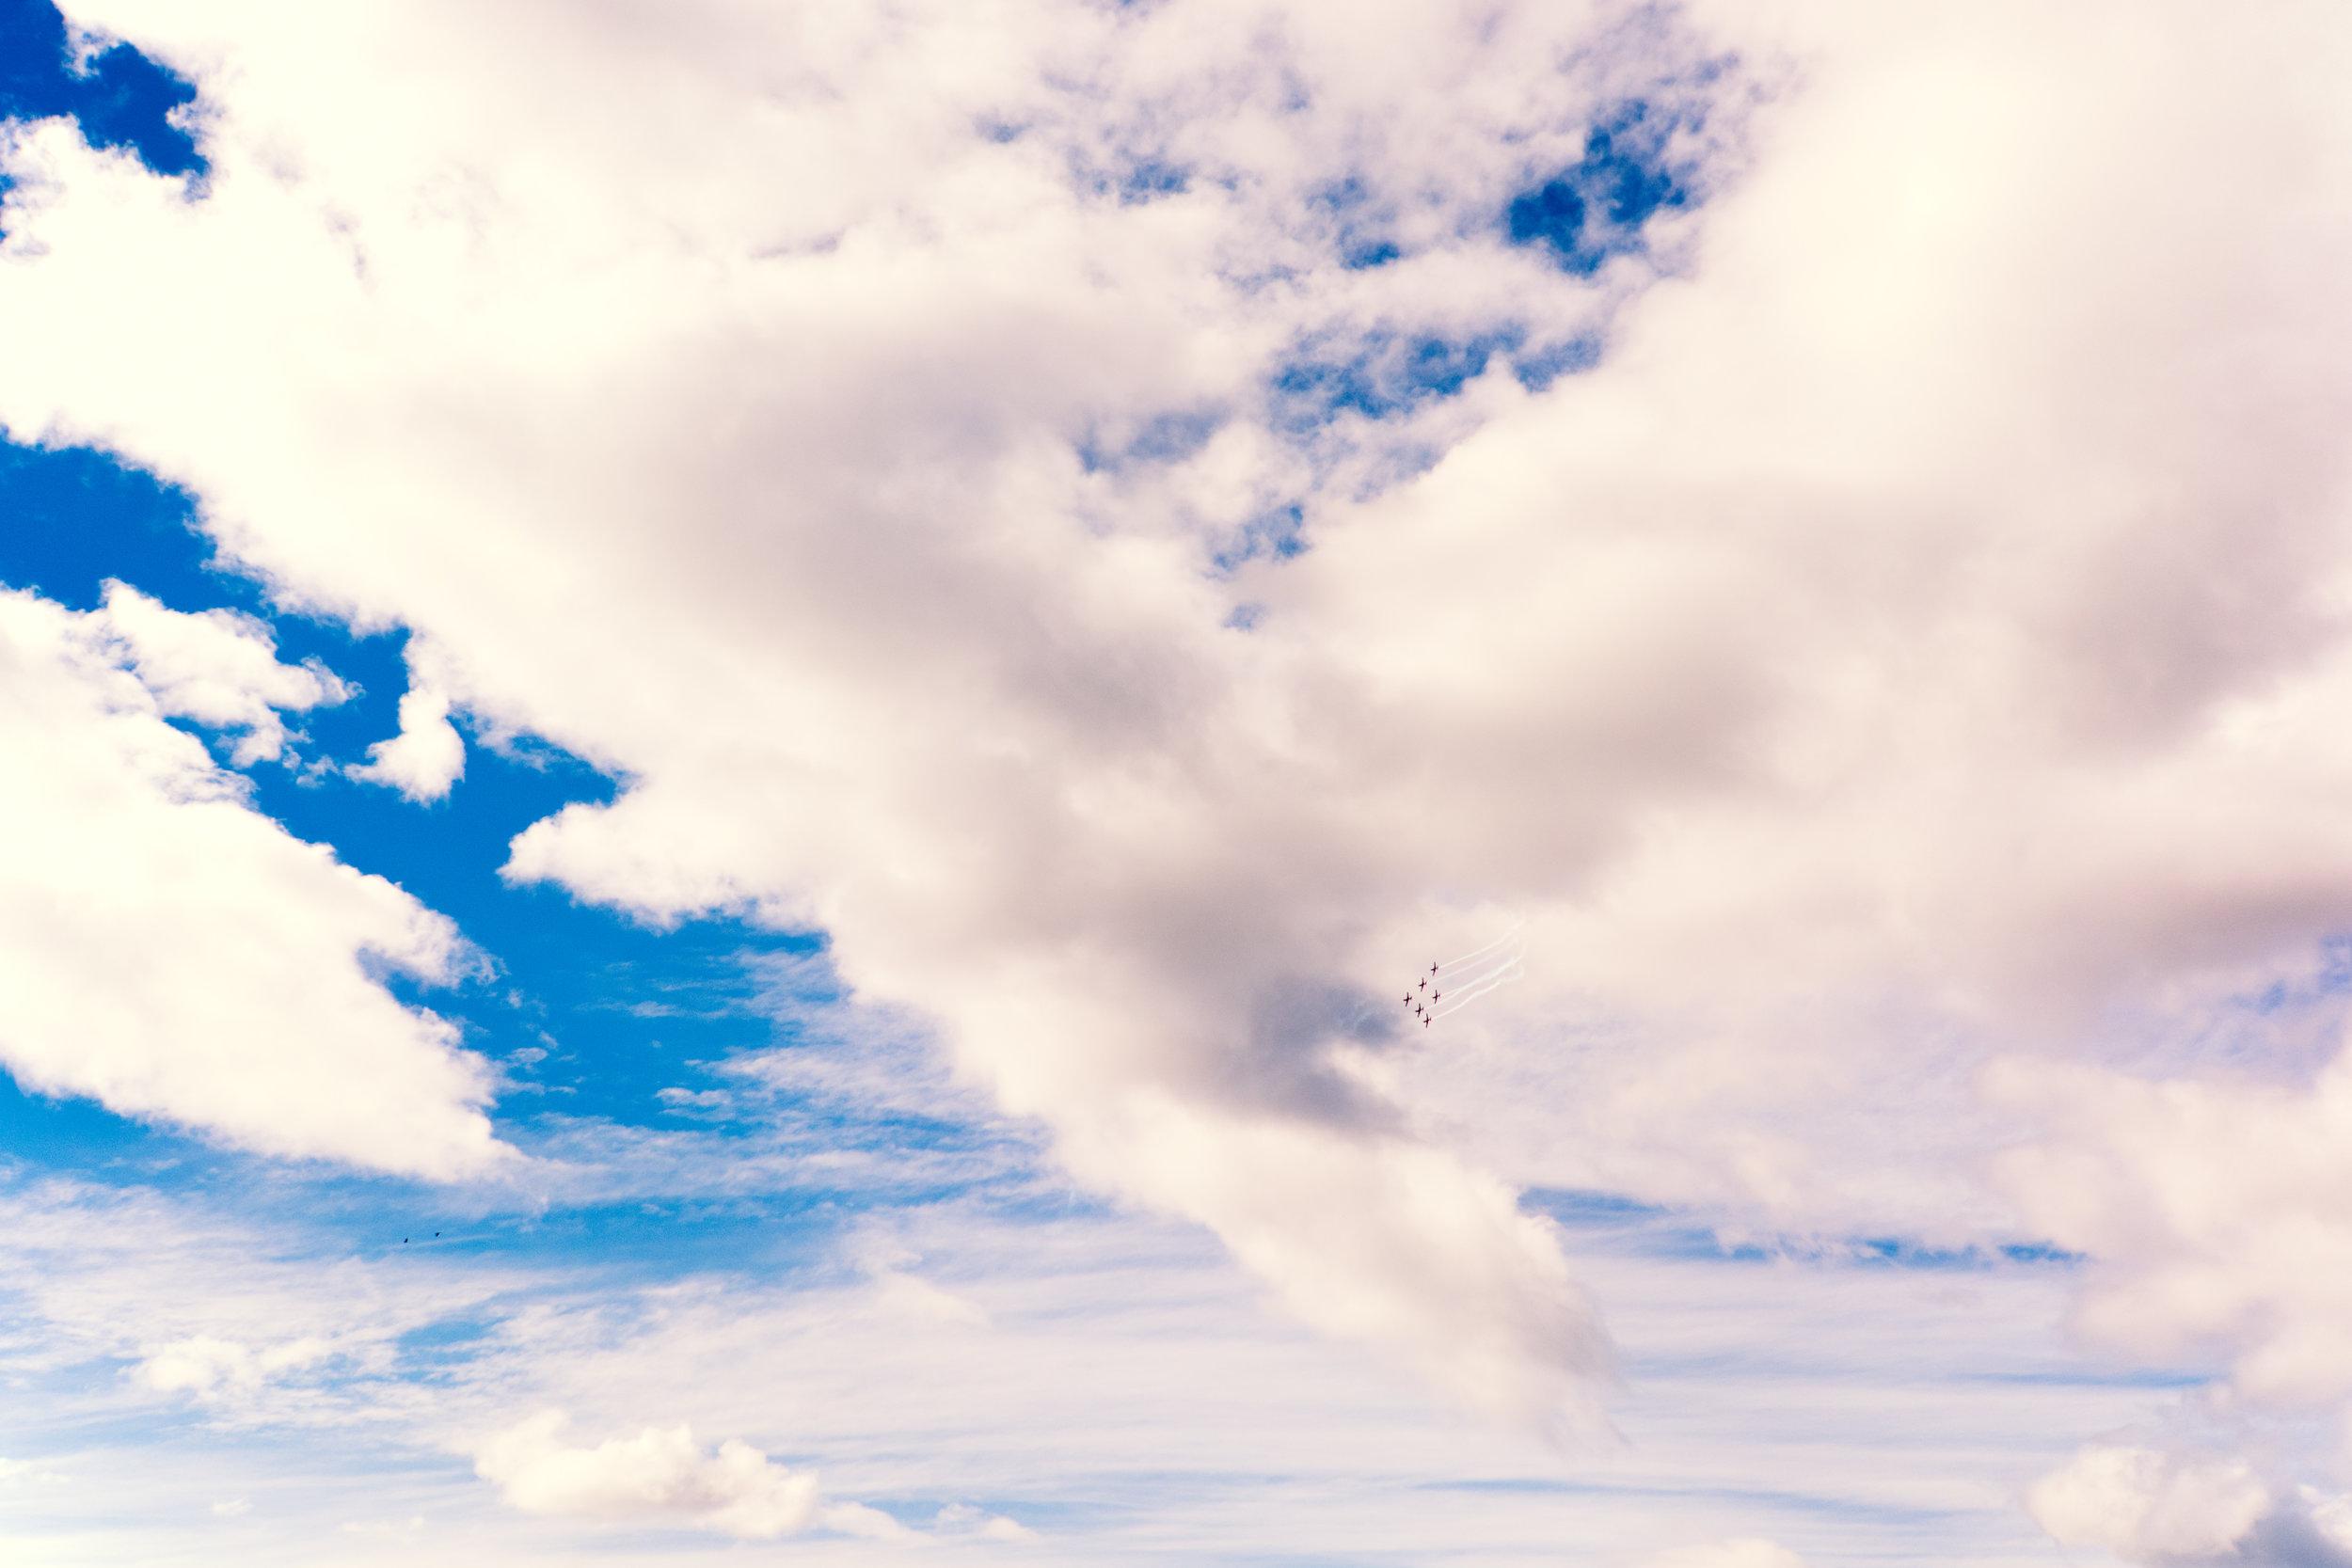 2013-09-13 - Hobart - Sandy Bay - Airforce Roulettes - untitled-7180-Edit.jpg